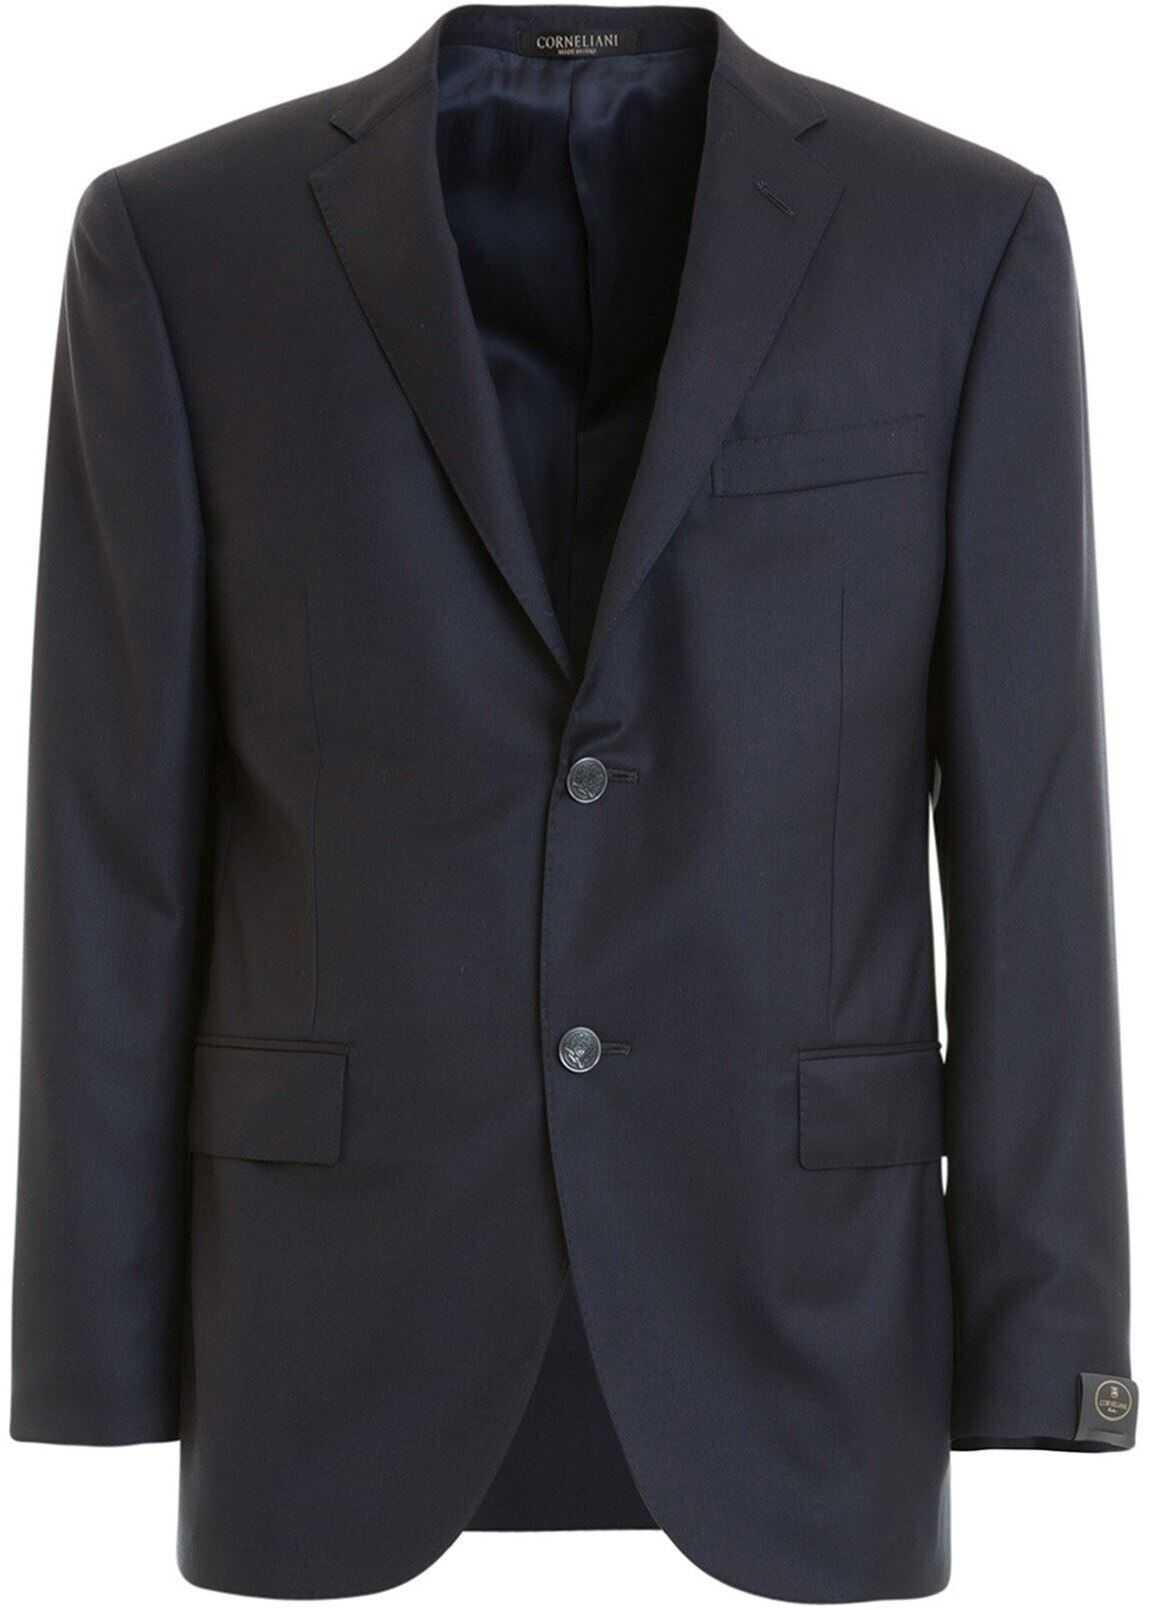 CORNELIANI Wool Classic Single-Breasted Blazer In Blue Blue imagine